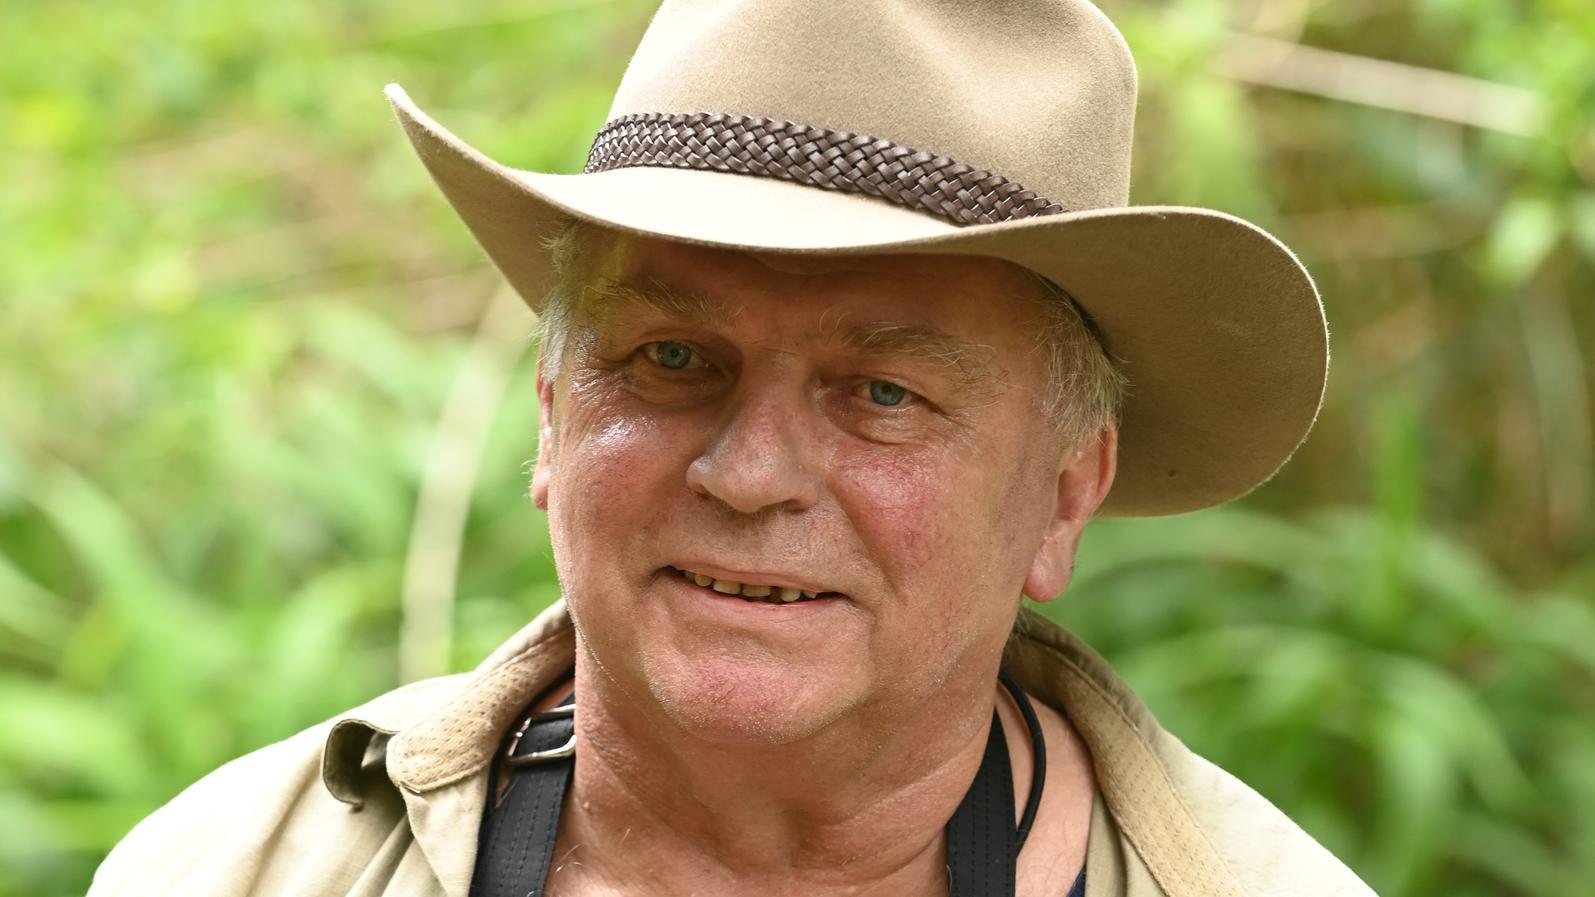 Minister Dschungelcamp